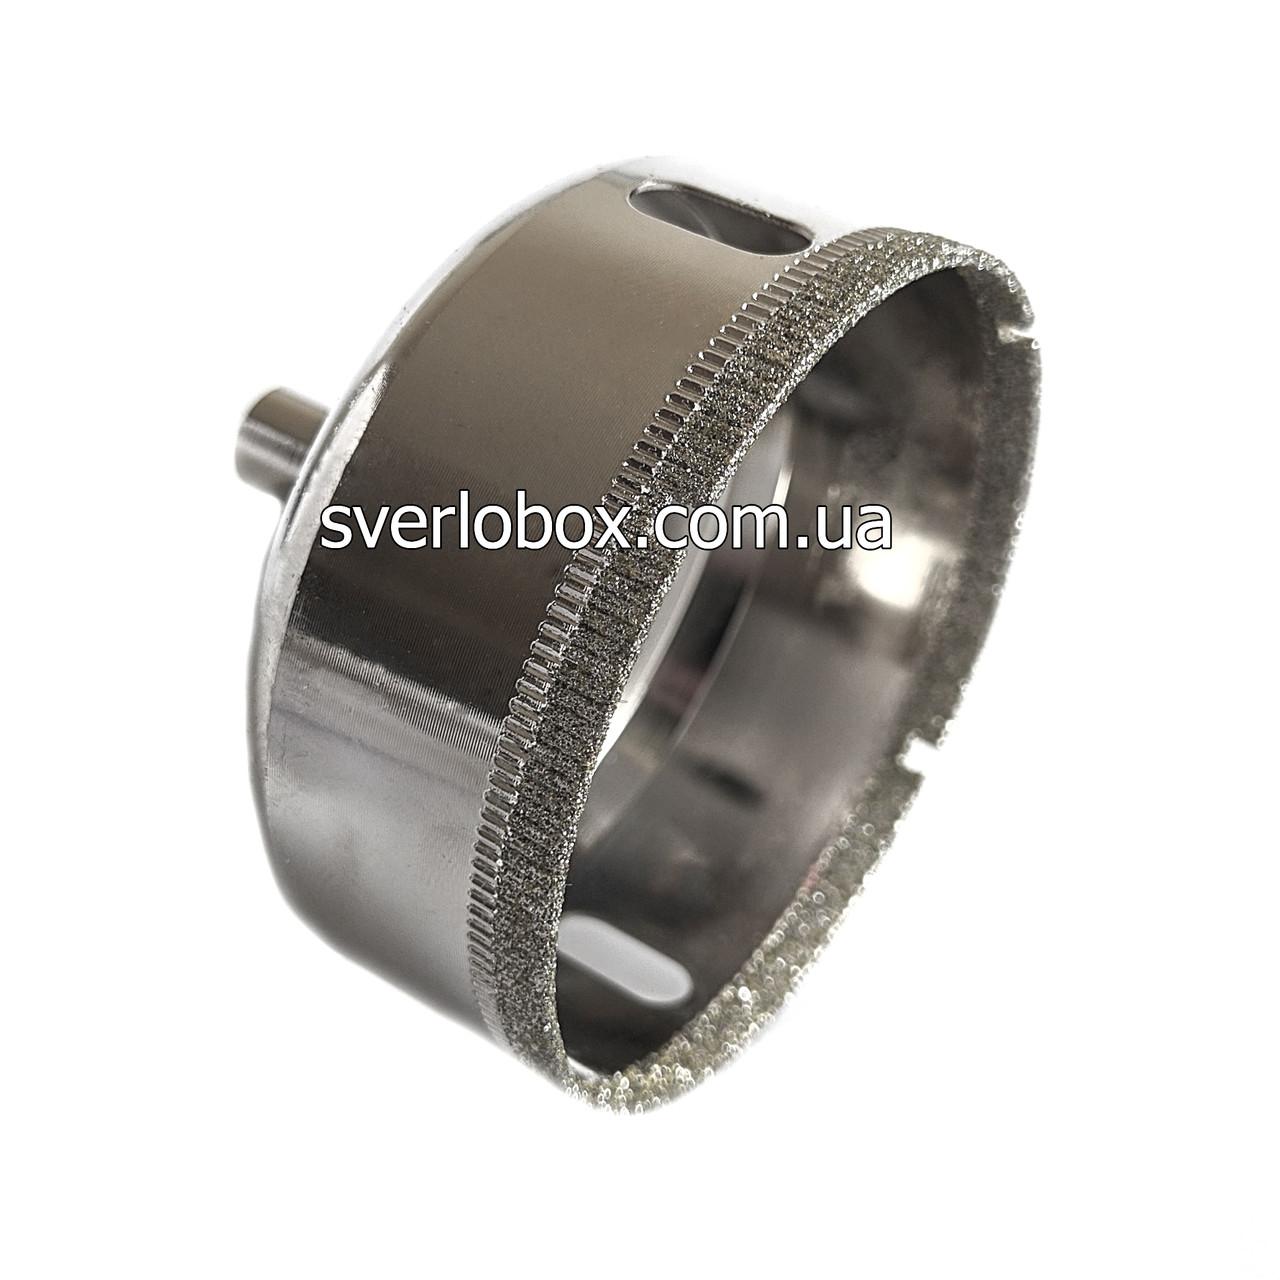 Коронка алмазная 28 мм